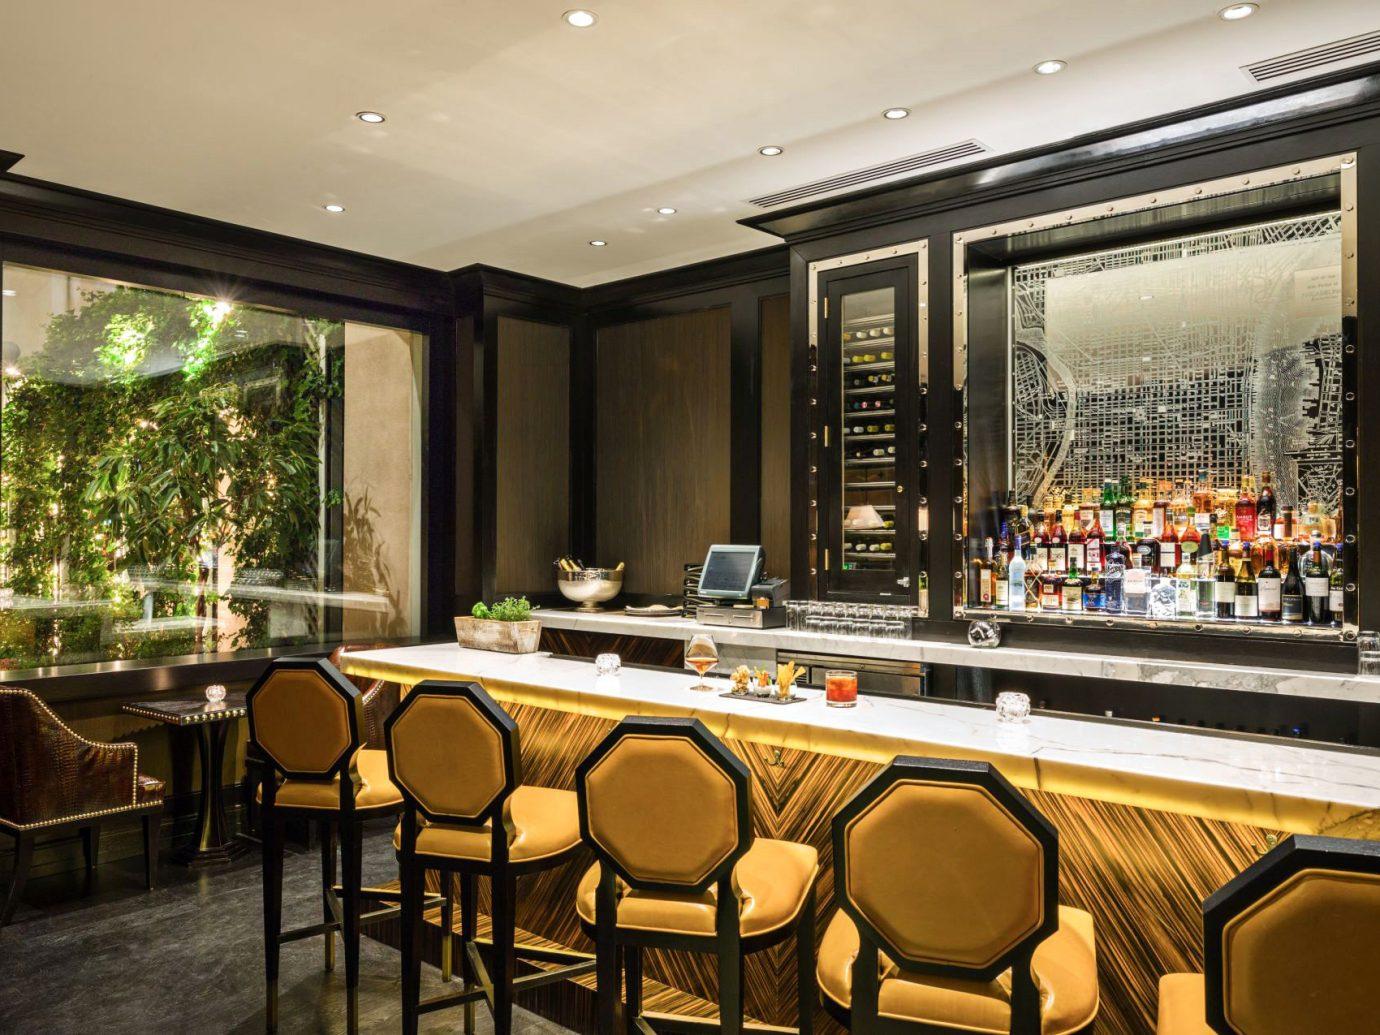 Bar Boutique Hotels Classic Dining Drink Eat Elegant Hotels Lounge Philadelphia indoor floor chair window room restaurant interior design estate Lobby café meal furniture several